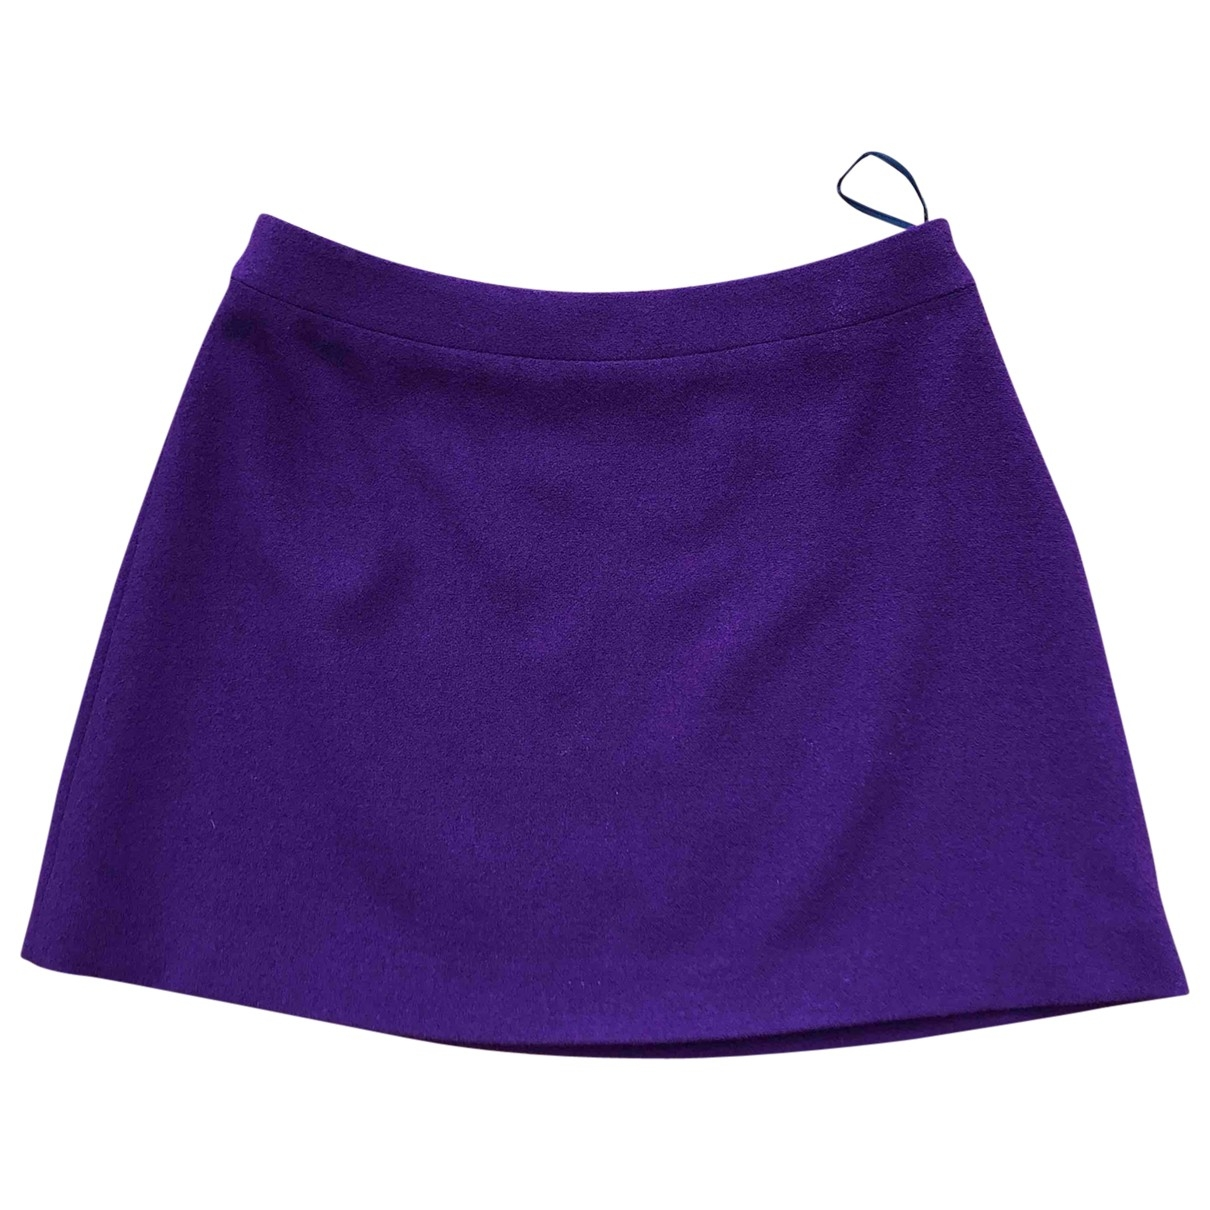 Miu Miu \N Purple Wool skirt for Women 42 IT